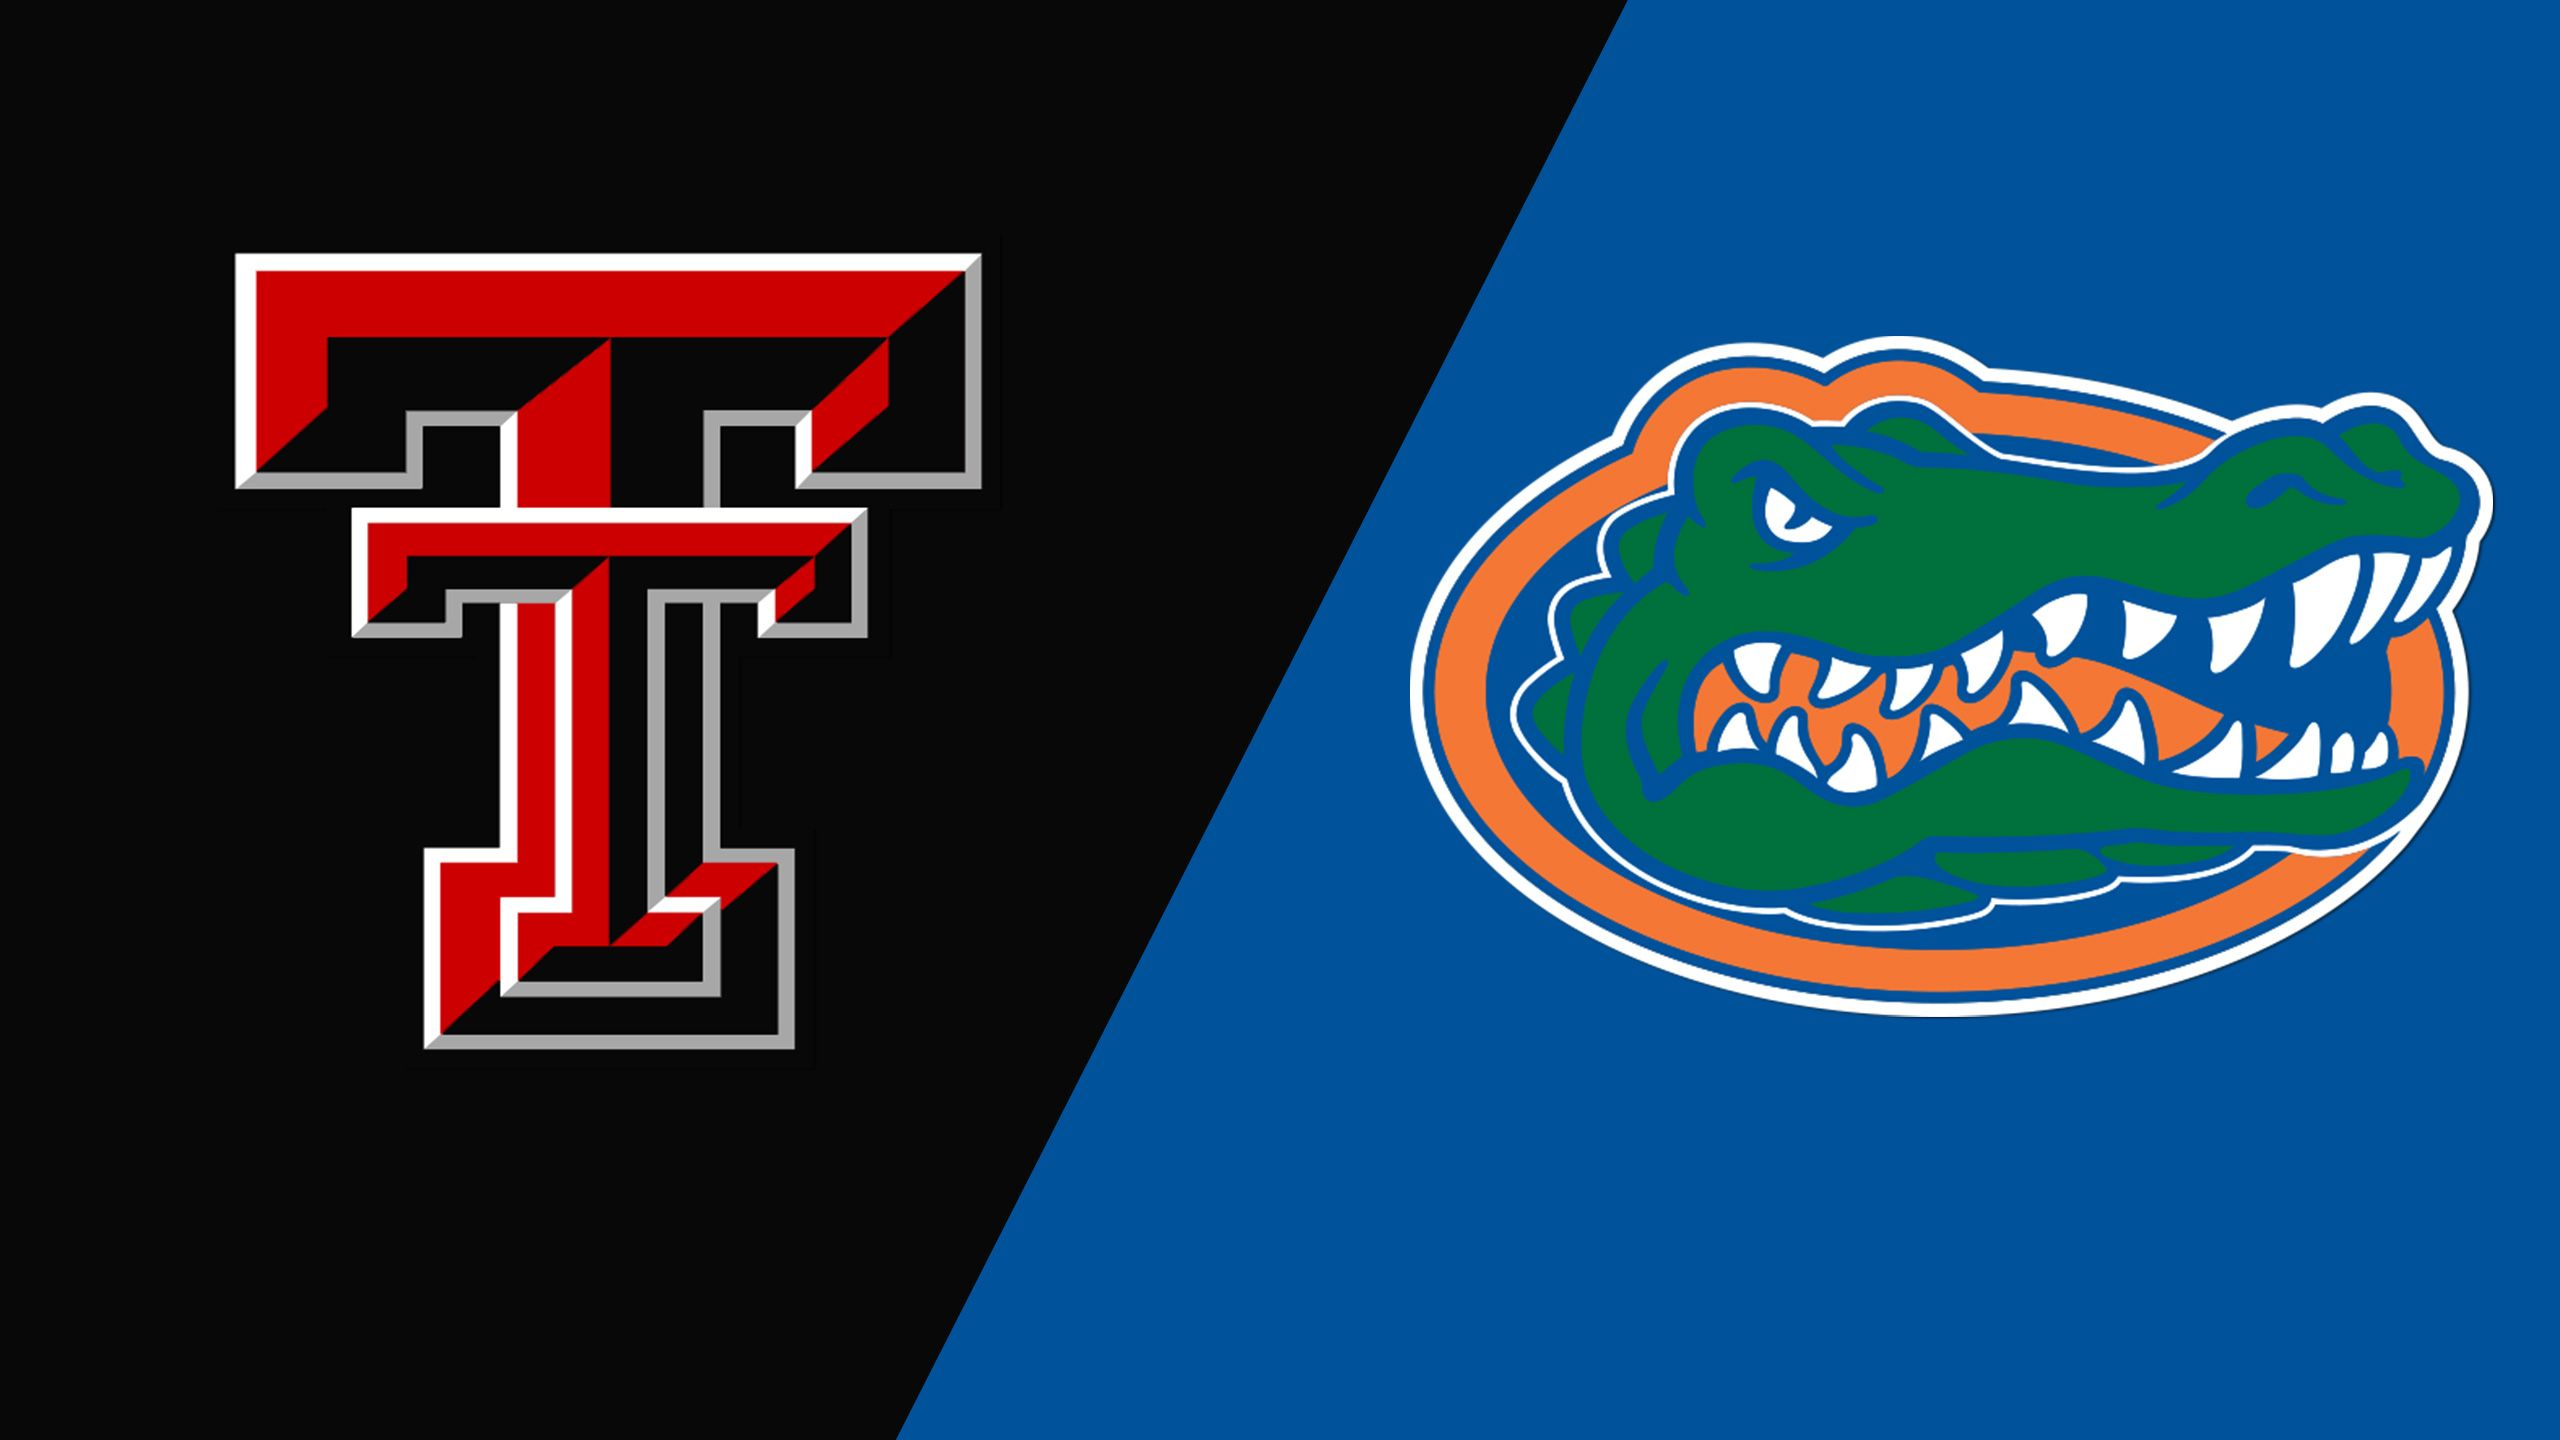 #9 Texas Tech vs. #1 Florida (Game 4) (College World Series)